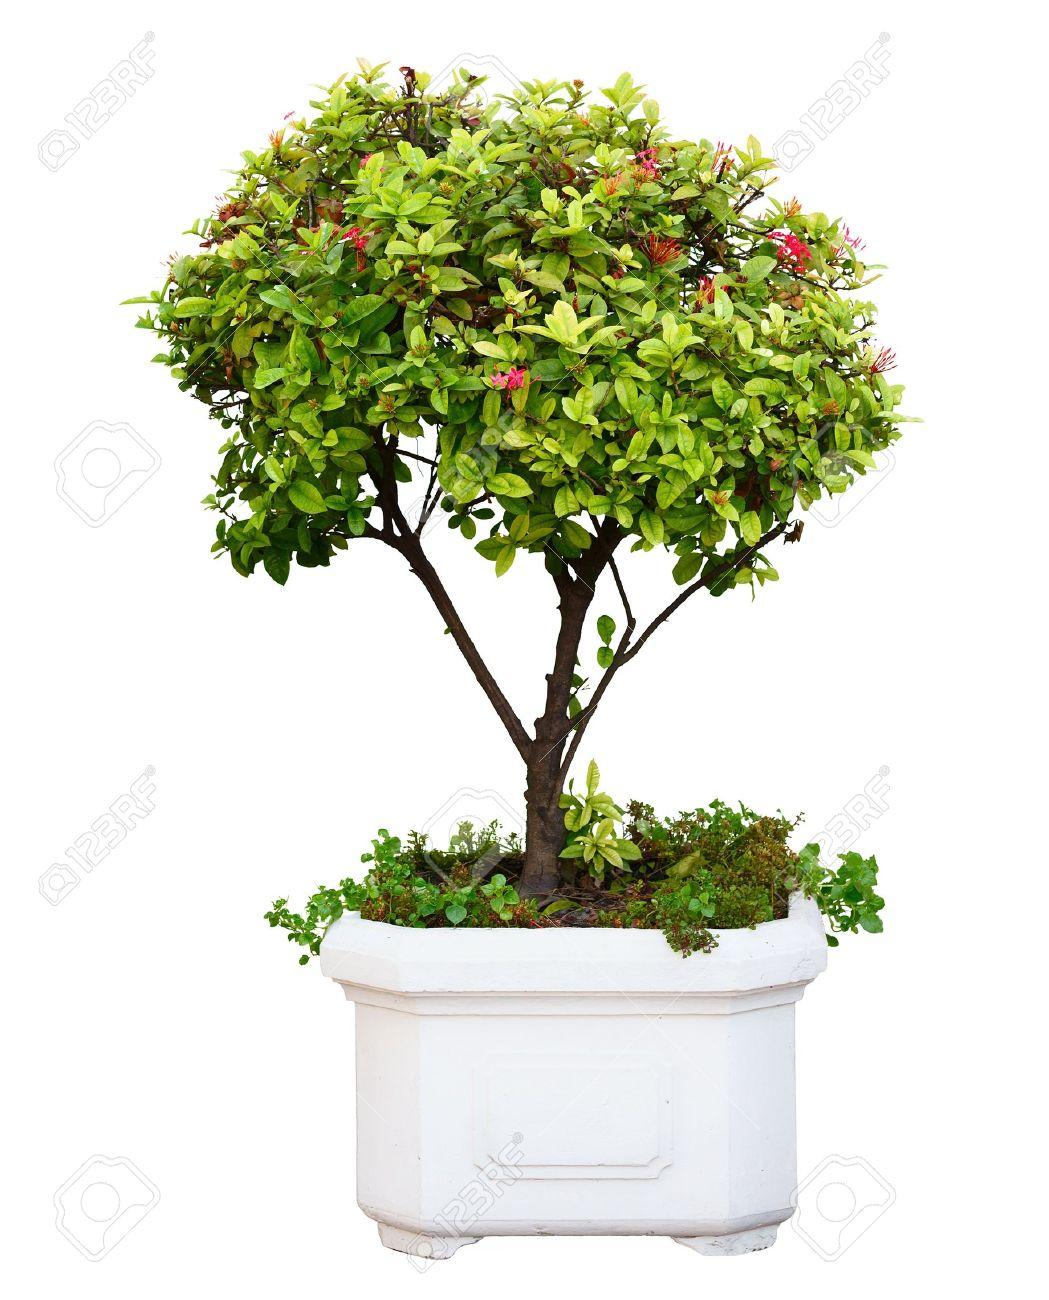 Boom In Pot.Bonsai Dwerg Groene Boom In Pot Gea Soleerd Op Witte Achtergrond